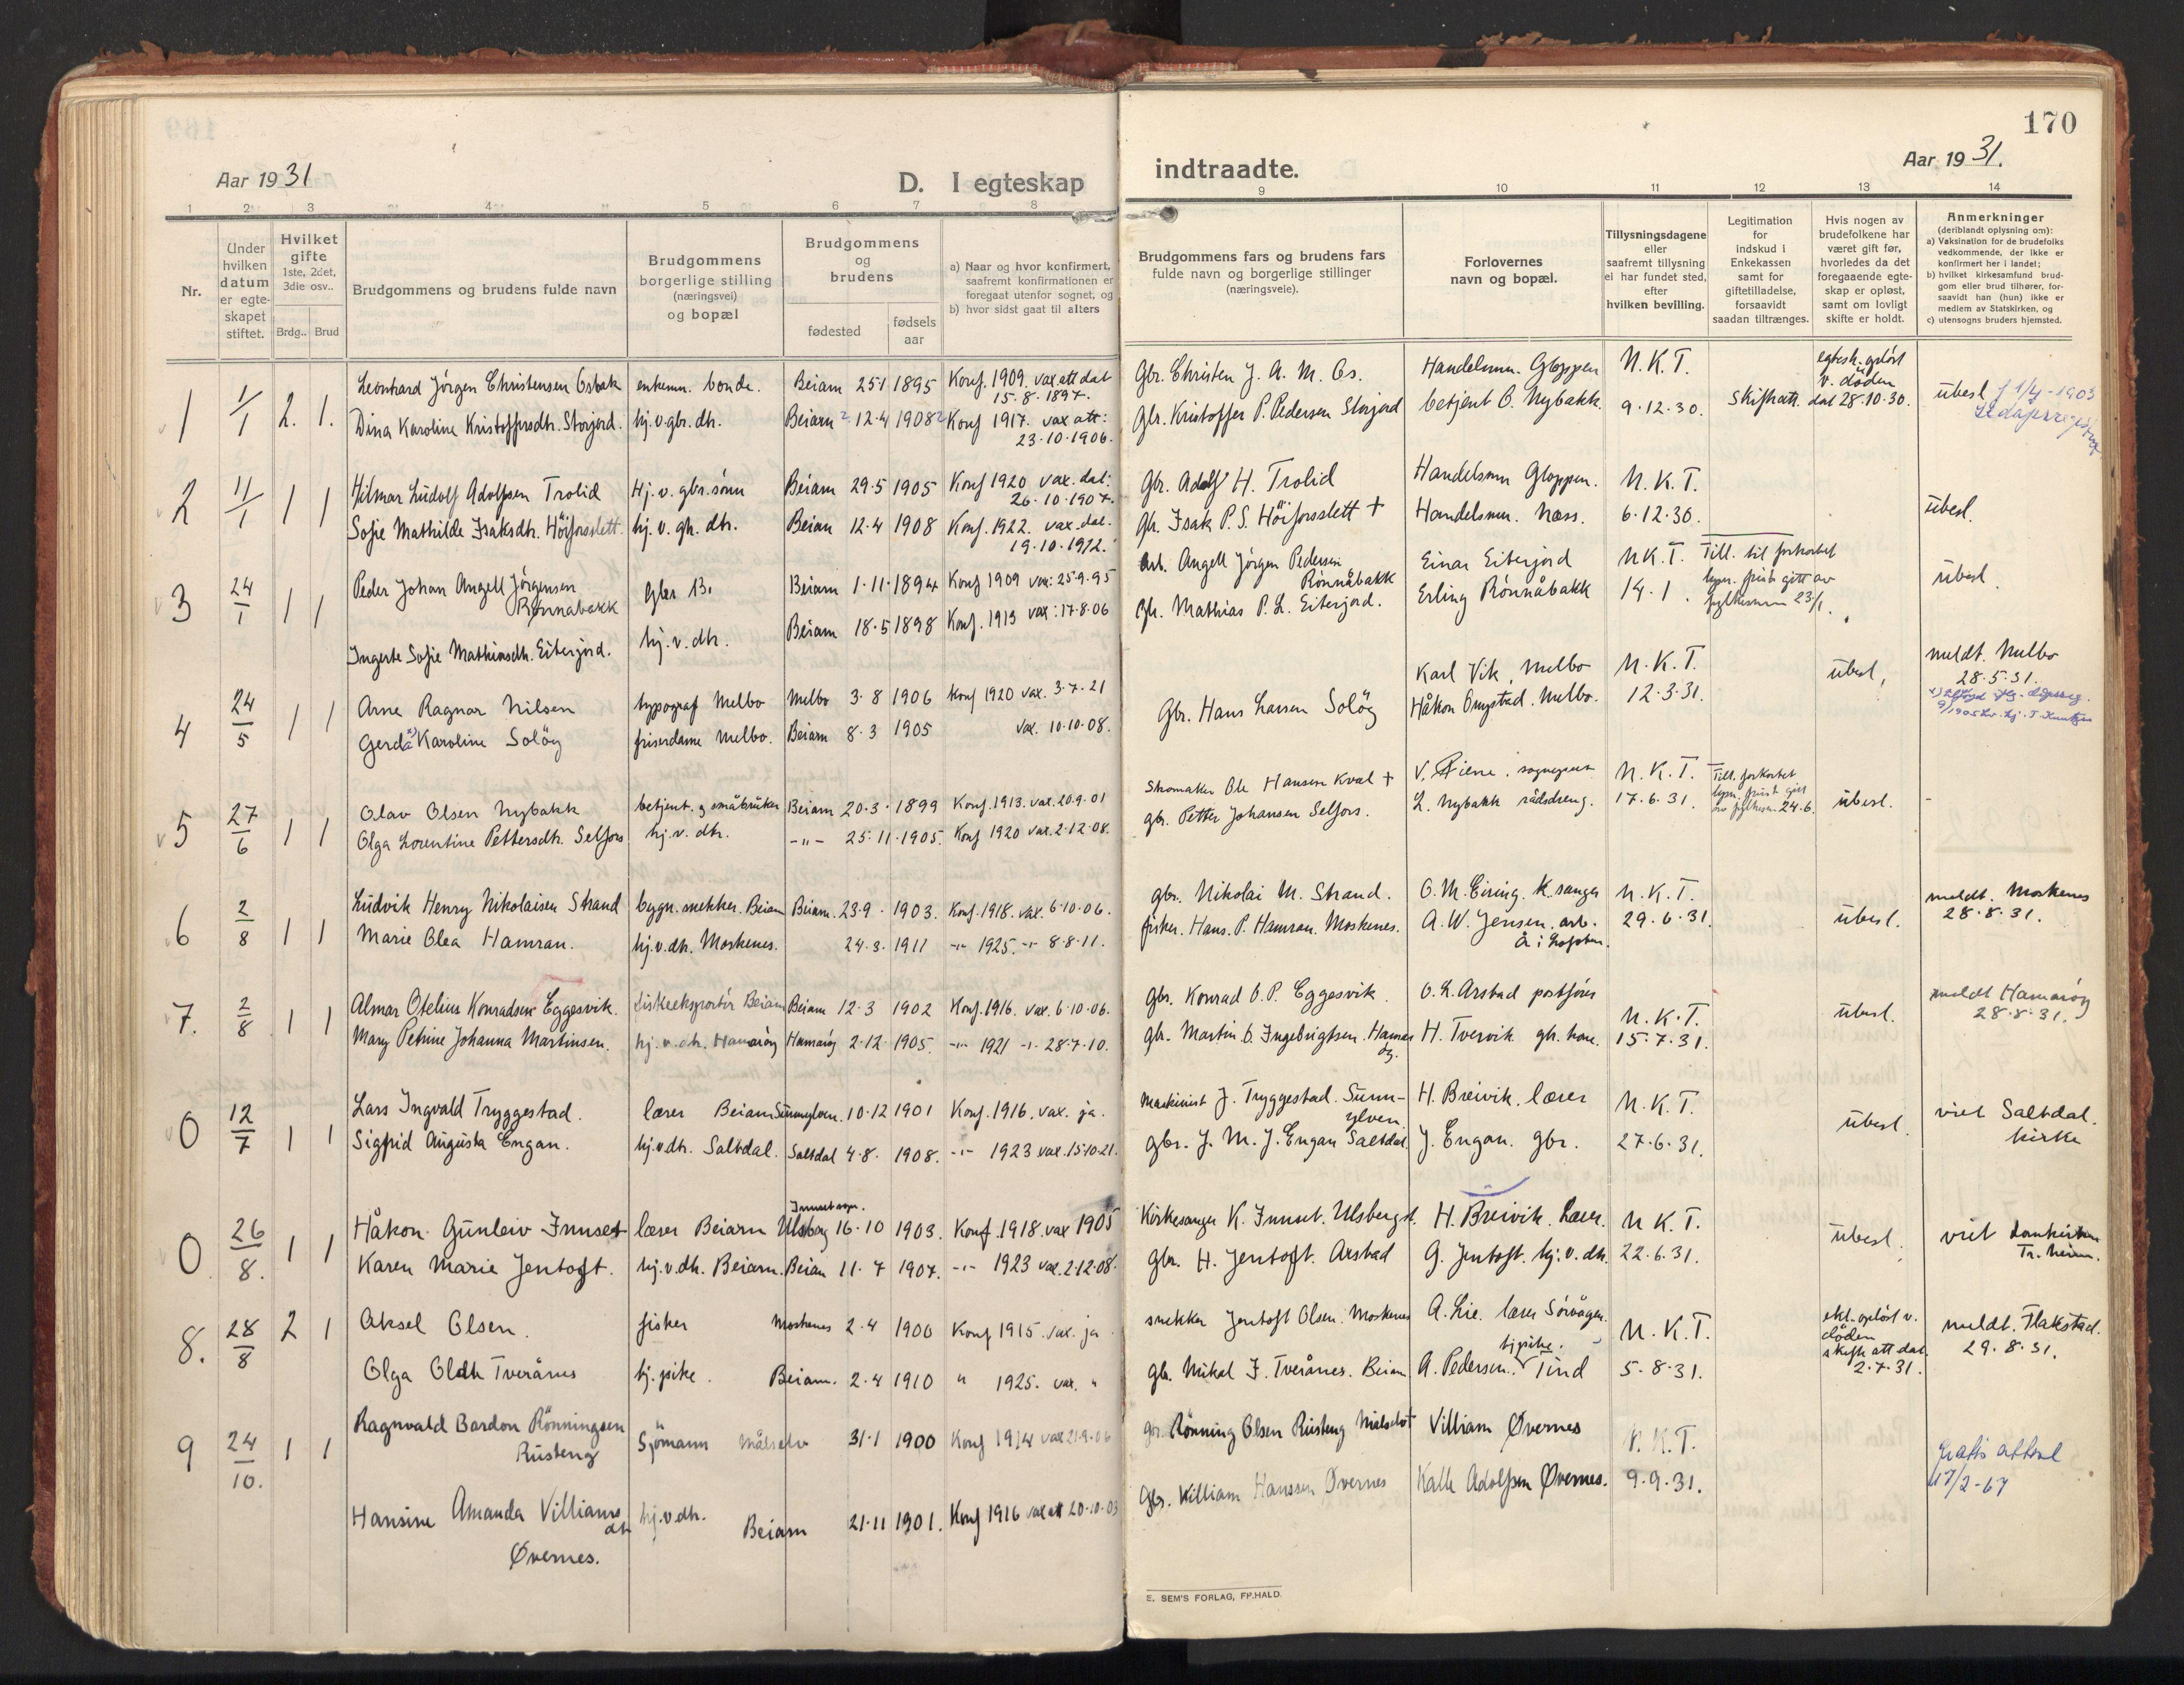 SAT, Ministerialprotokoller, klokkerbøker og fødselsregistre - Nordland, 846/L0650: Ministerialbok nr. 846A08, 1916-1935, s. 170